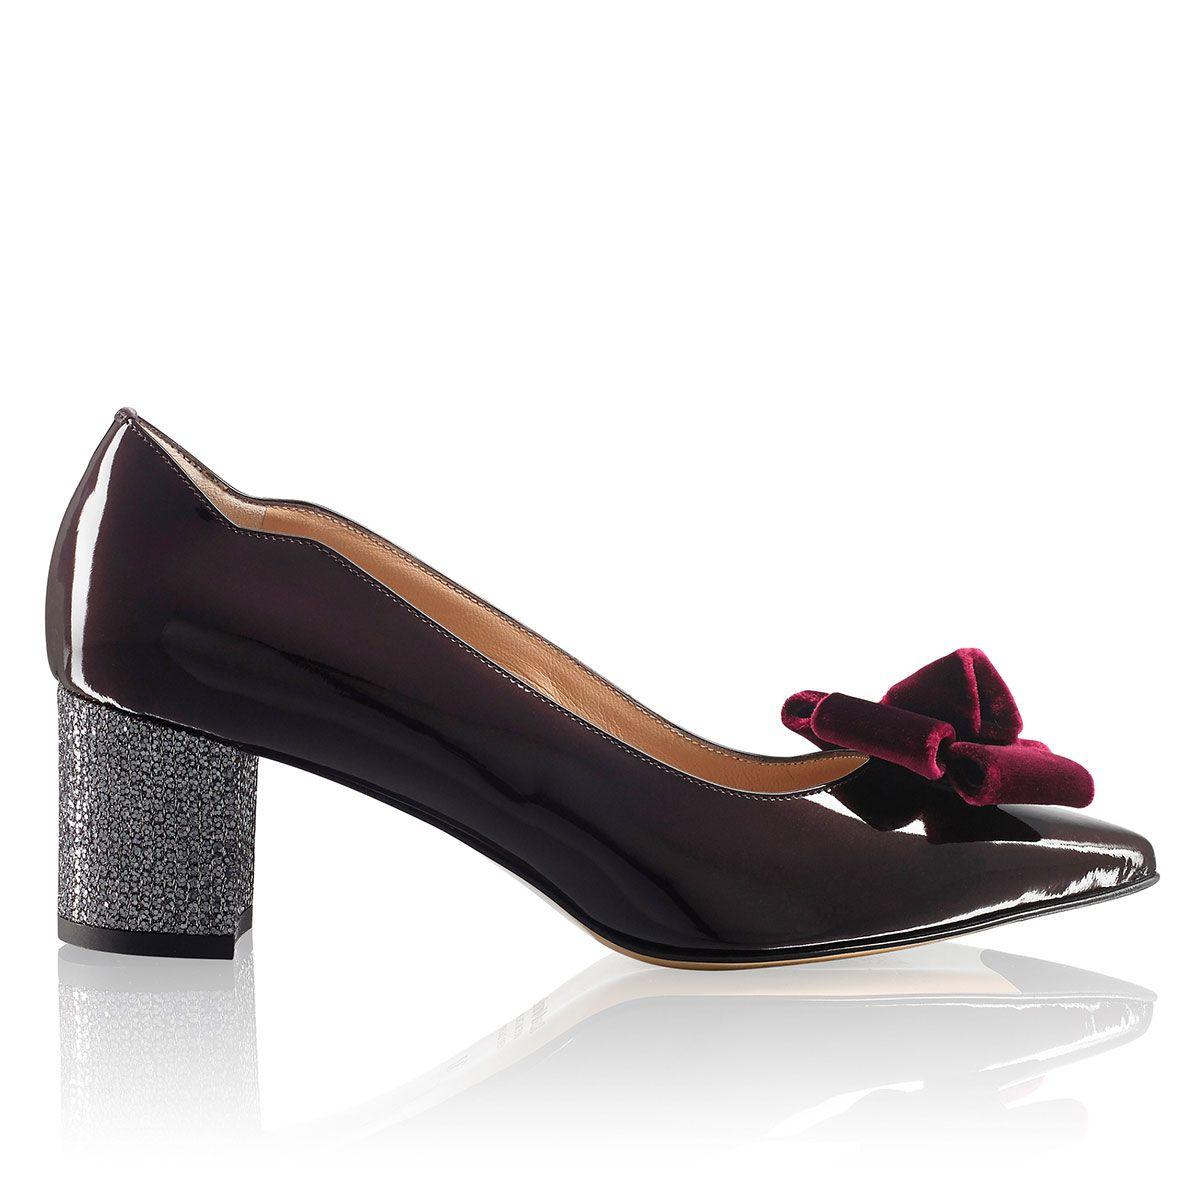 Footwear design women, Designer shoes